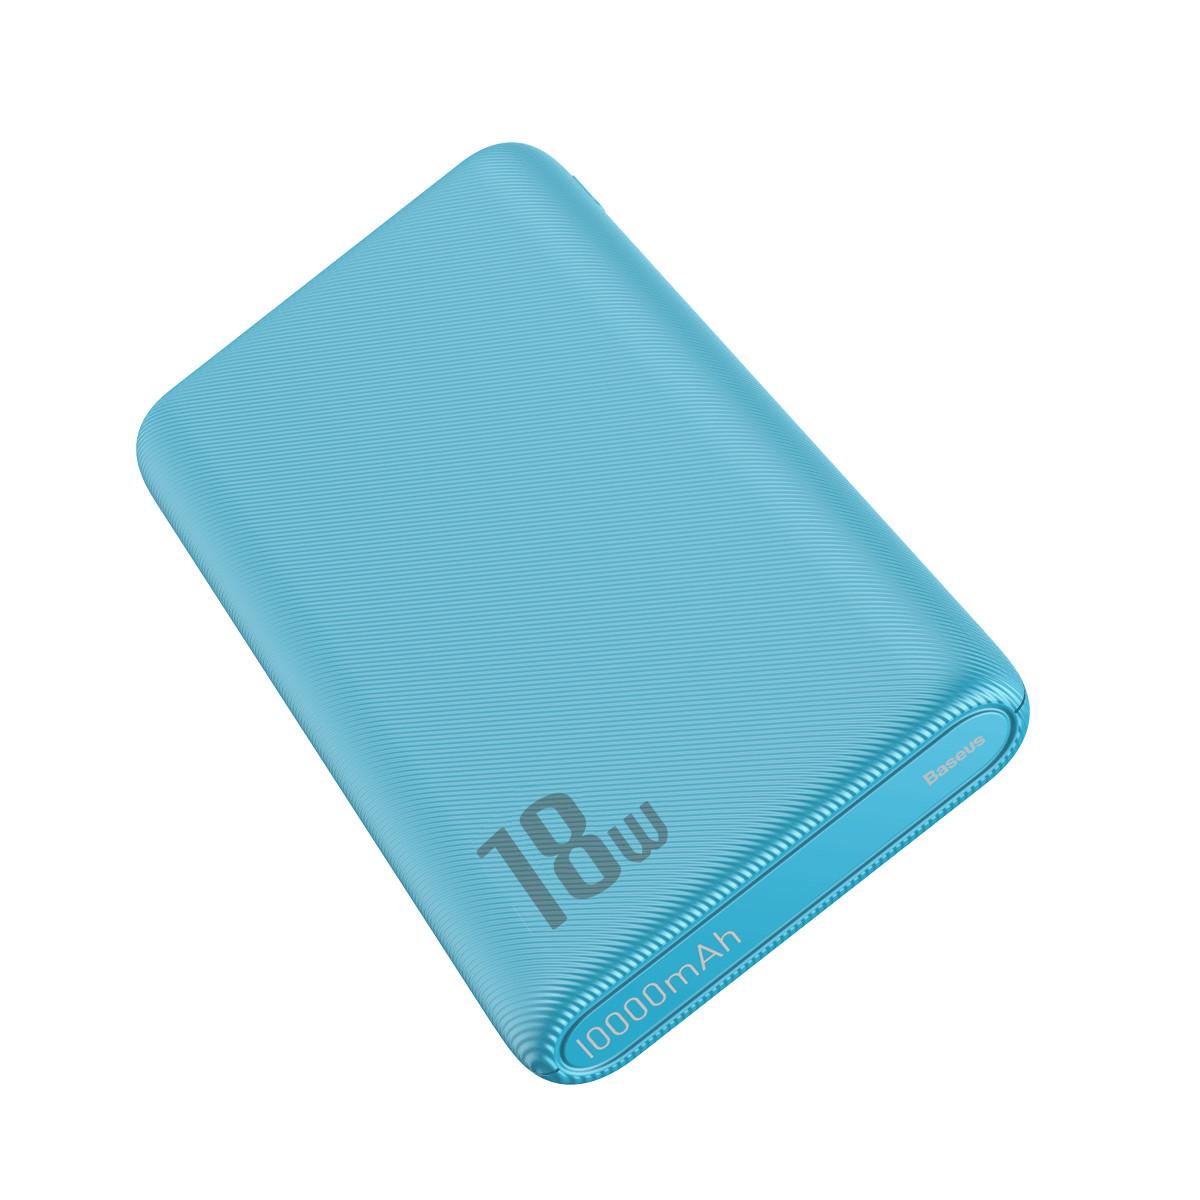 Power Bank Baseus Bipow PD+QC 10000mAh Blue - 3